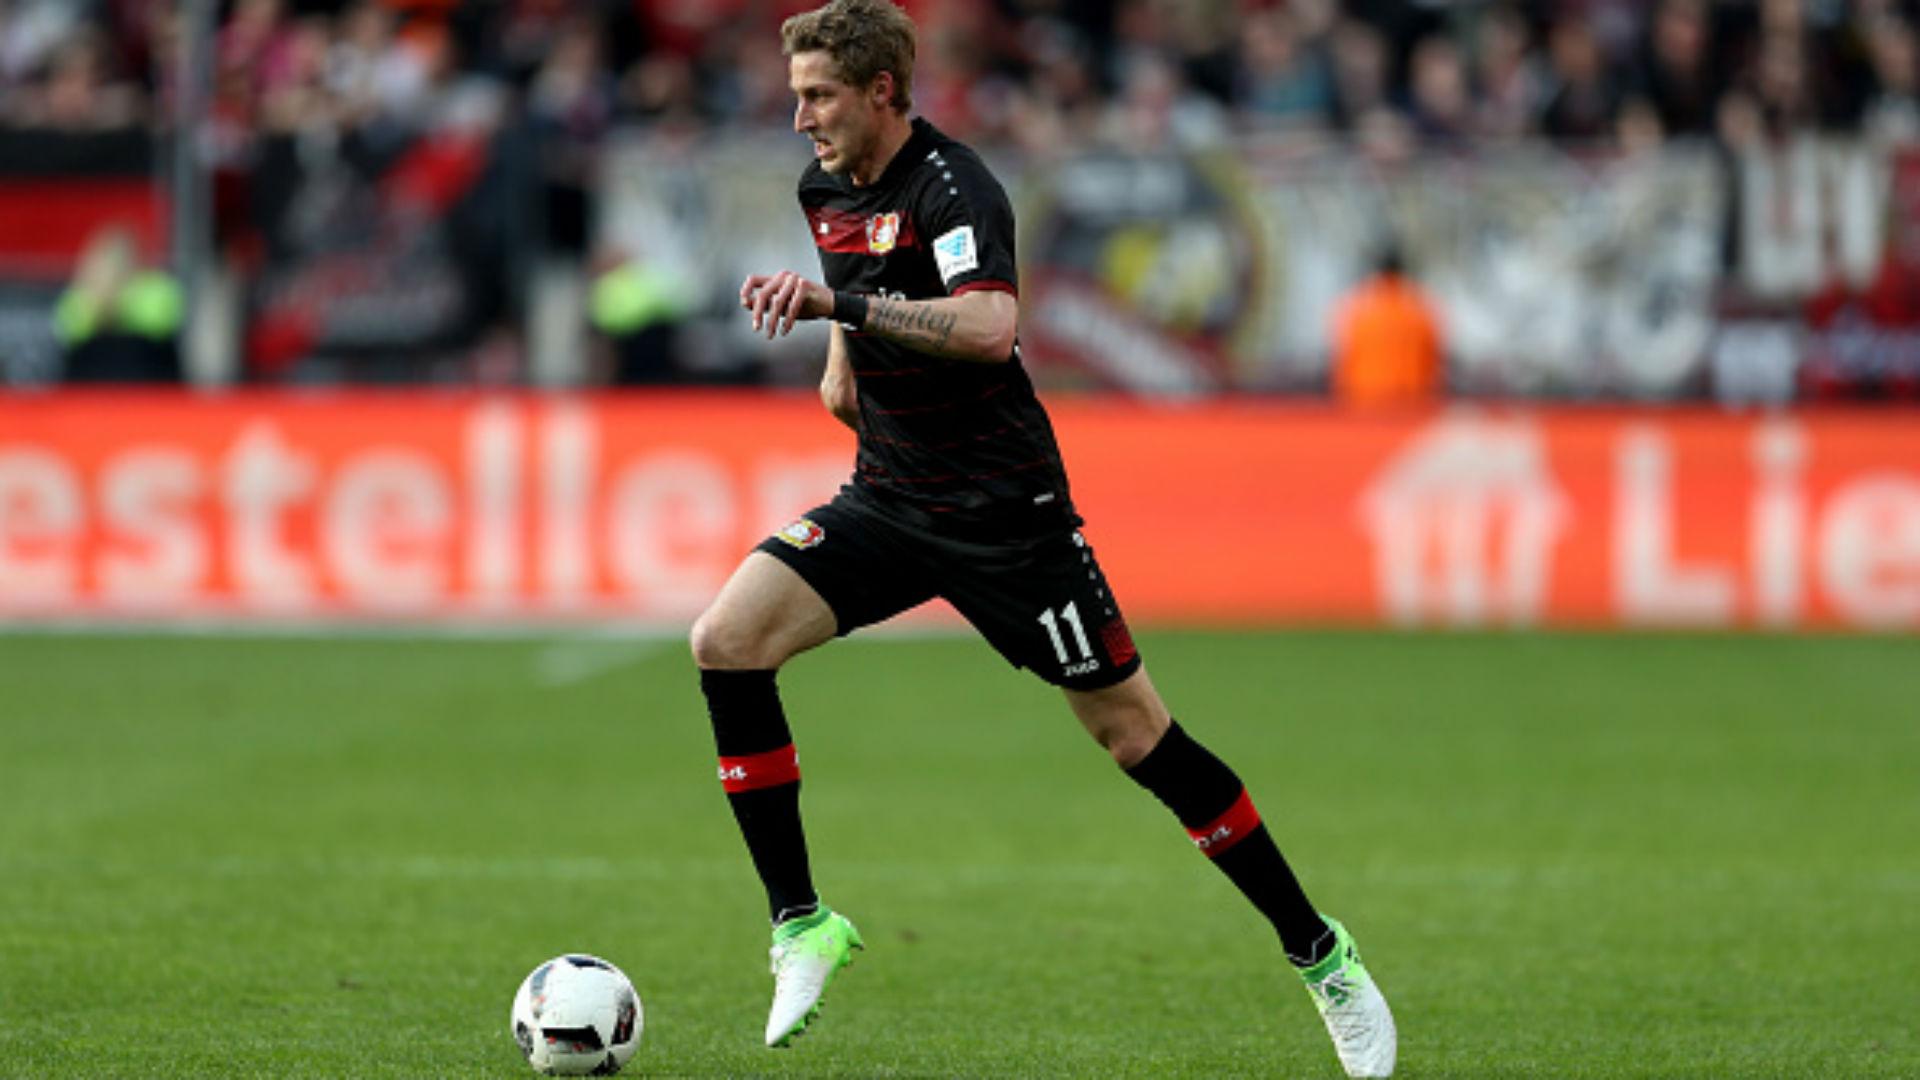 Kiessling Leverkusen Wolfsburgo Bundesliga 02042017